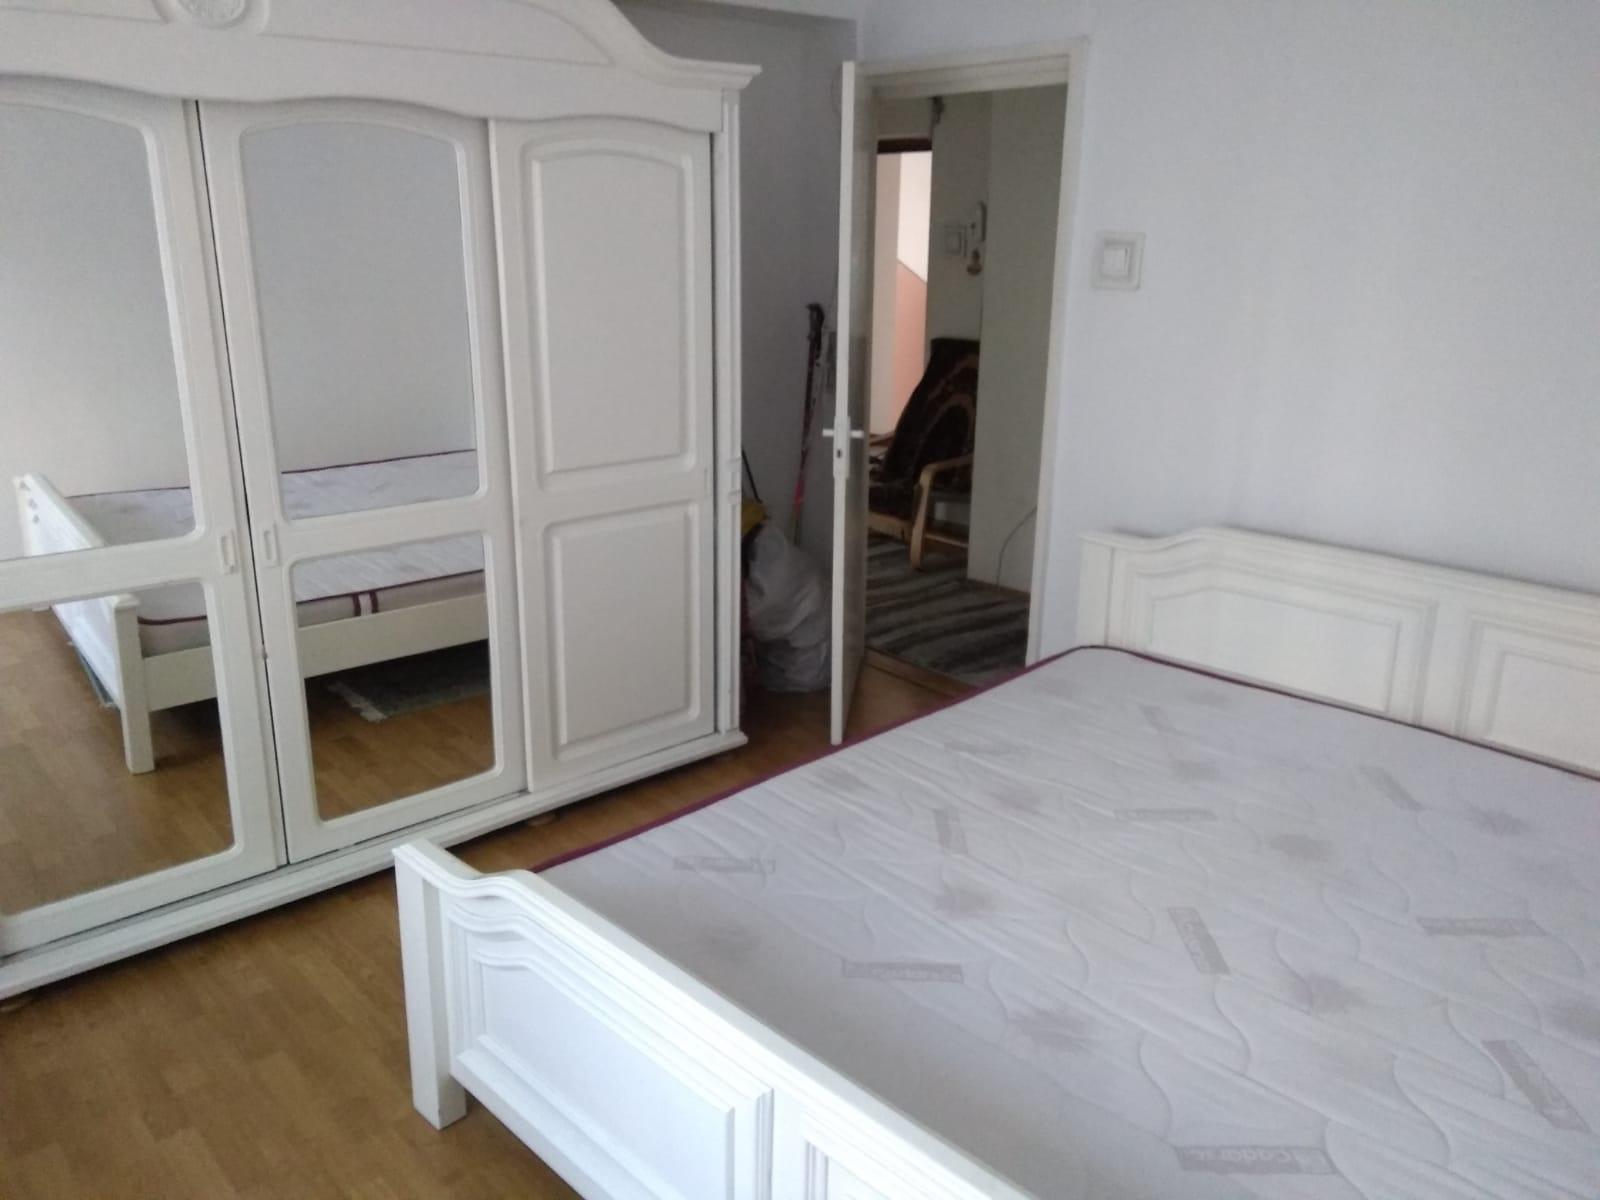 186697-Vanzare apartament 2 camere, Marasti, Cluj-Napoca